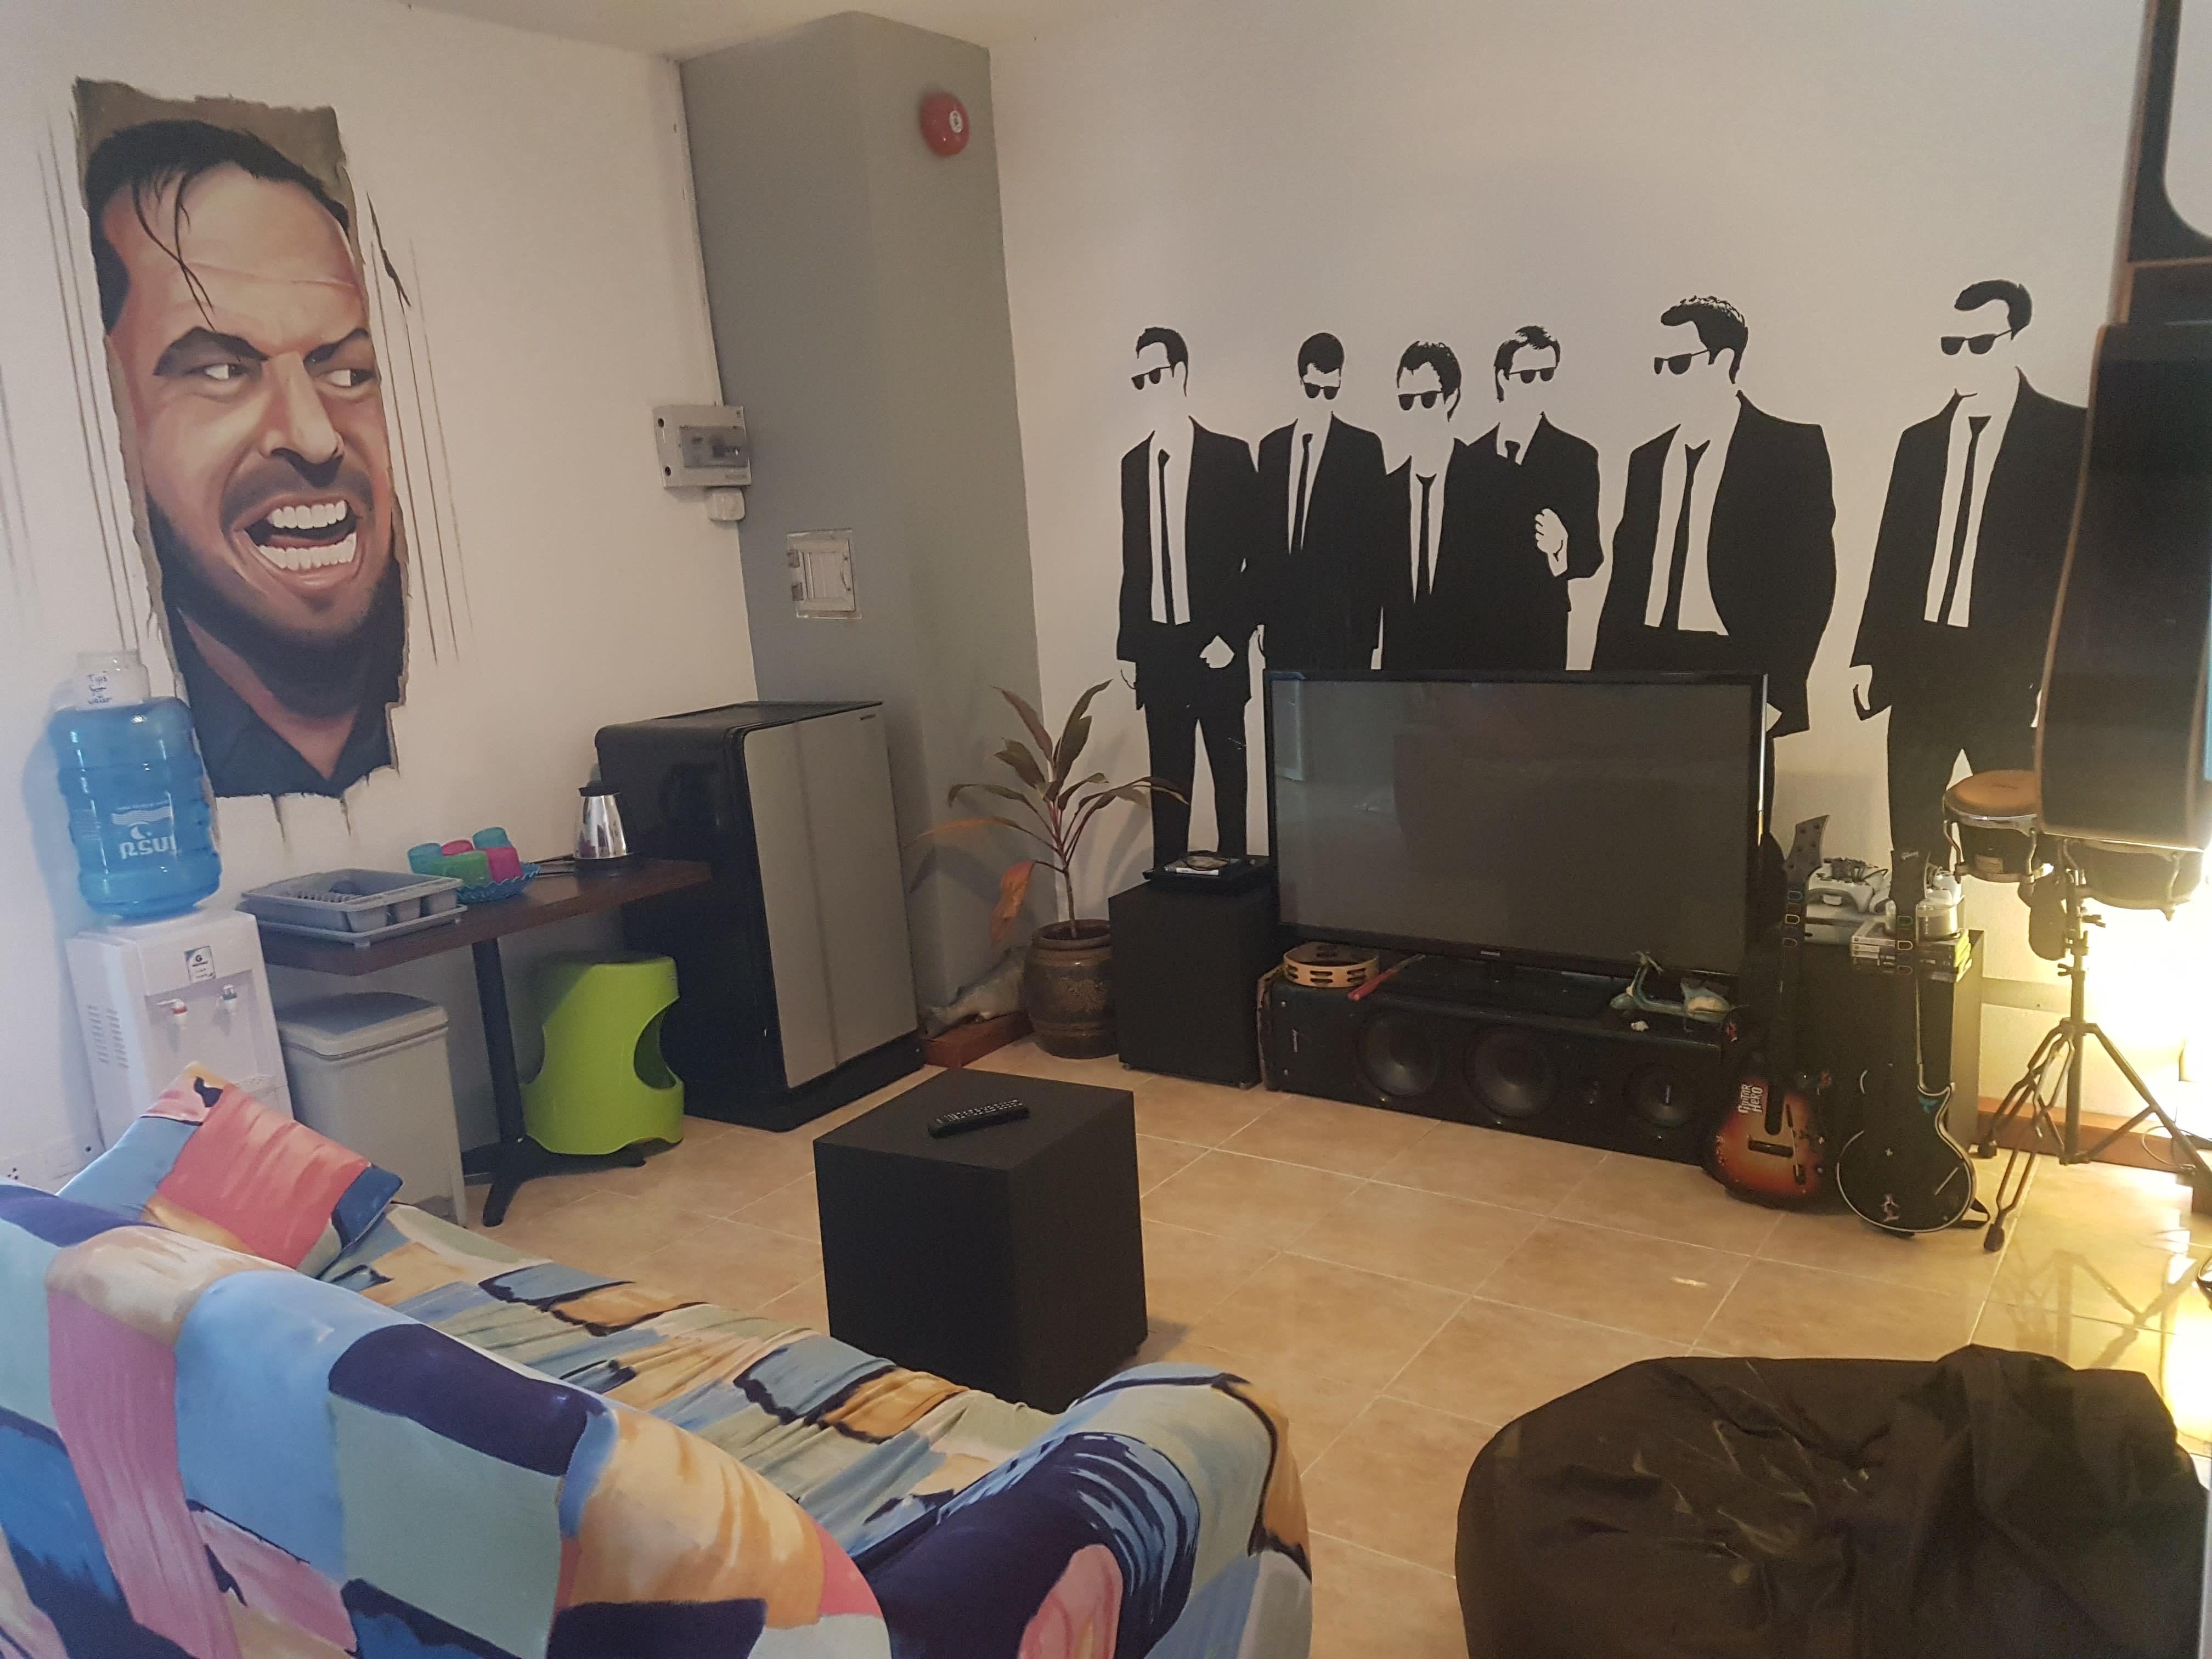 K-Bunk Hostel